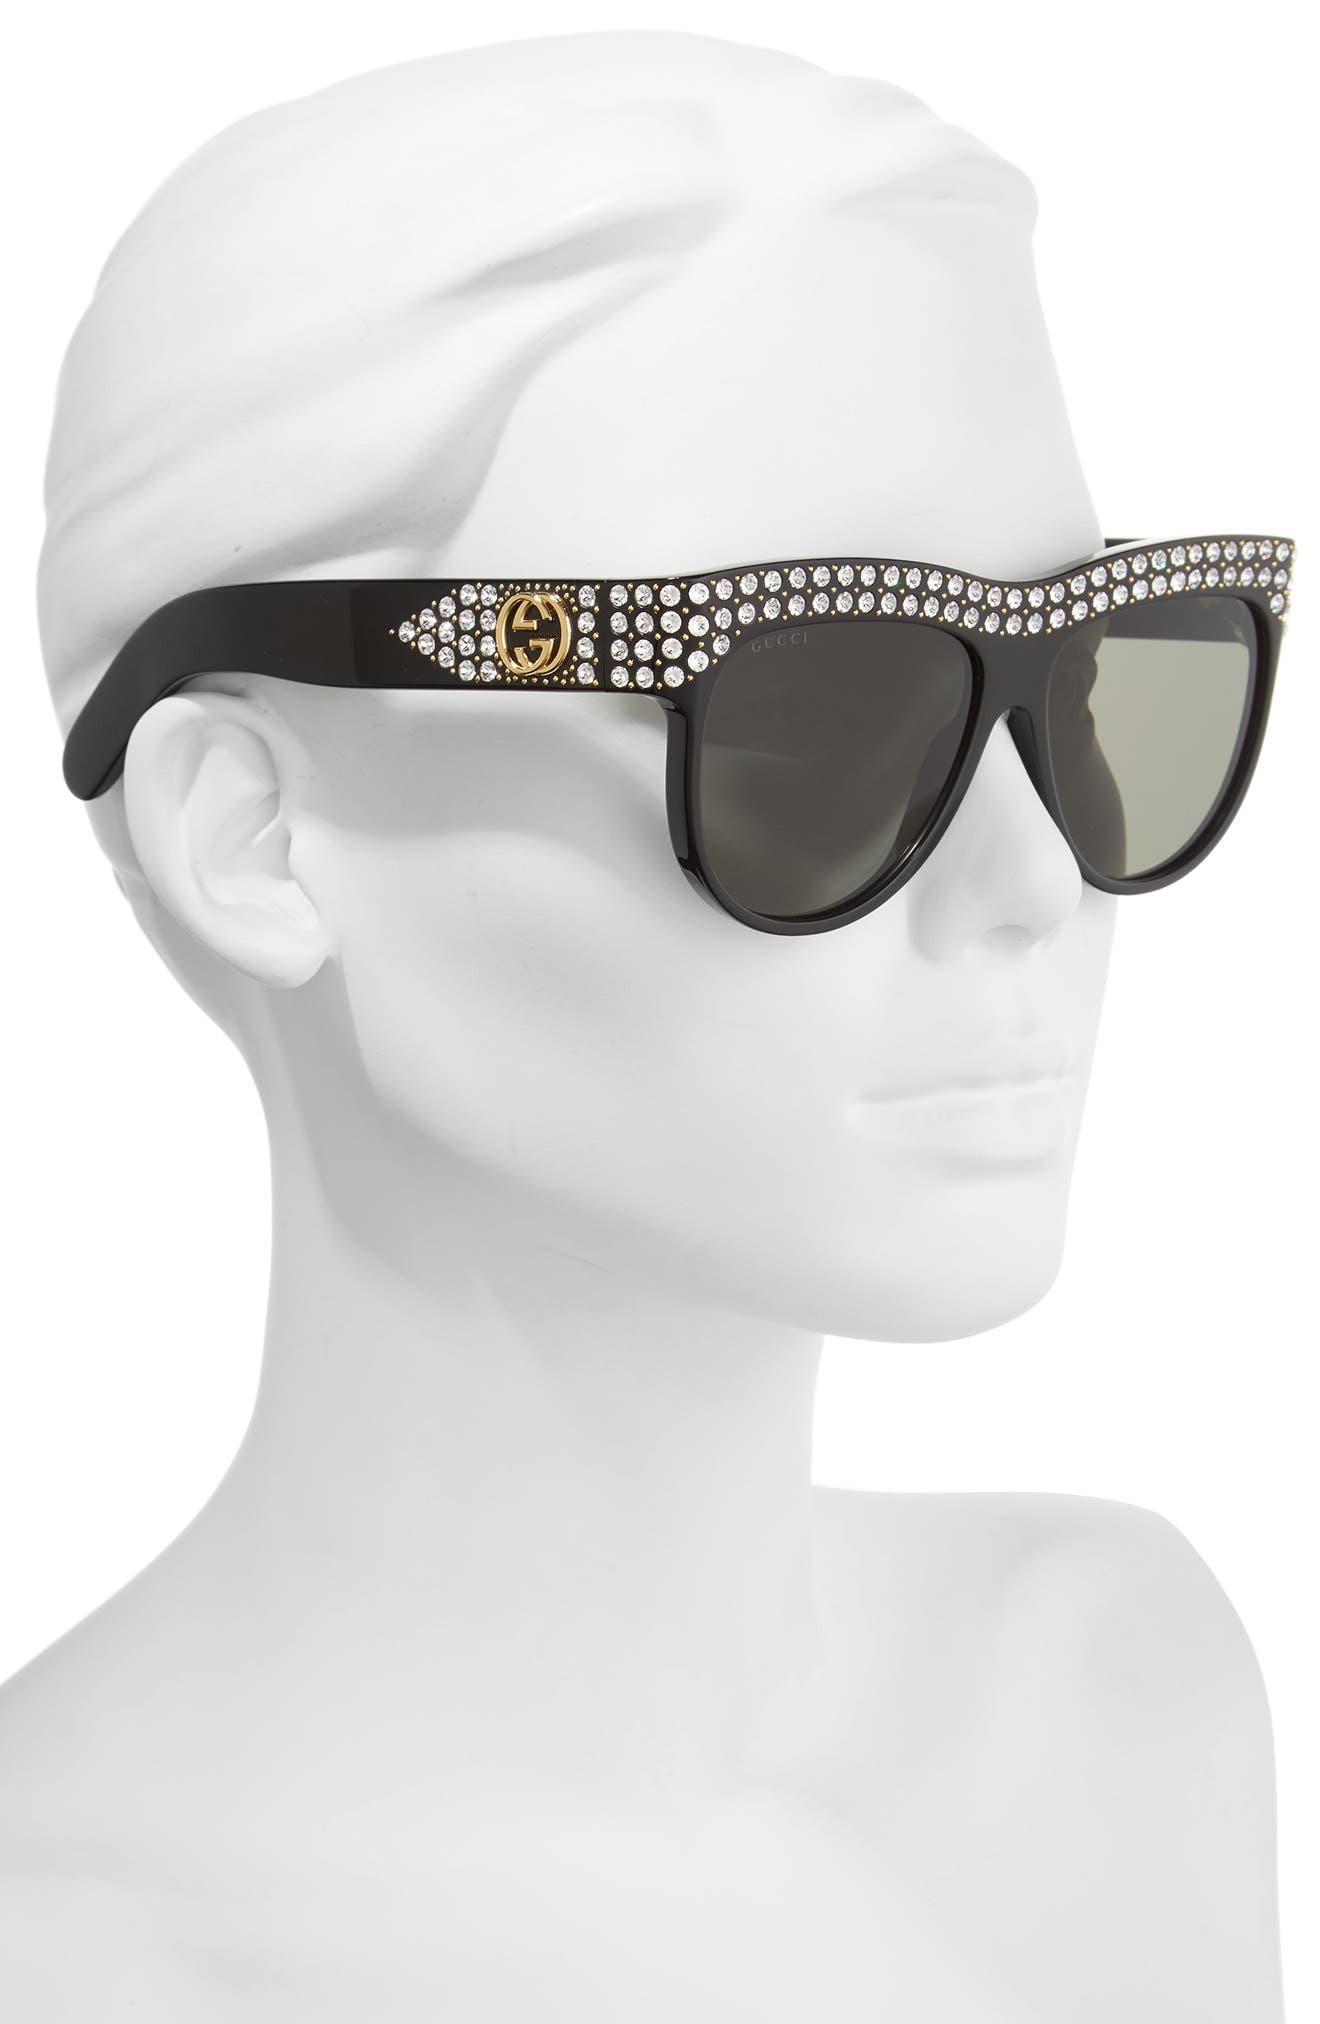 56mm Cat Eye Sunglasses,                             Alternate thumbnail 2, color,                             BLACK/ GREY